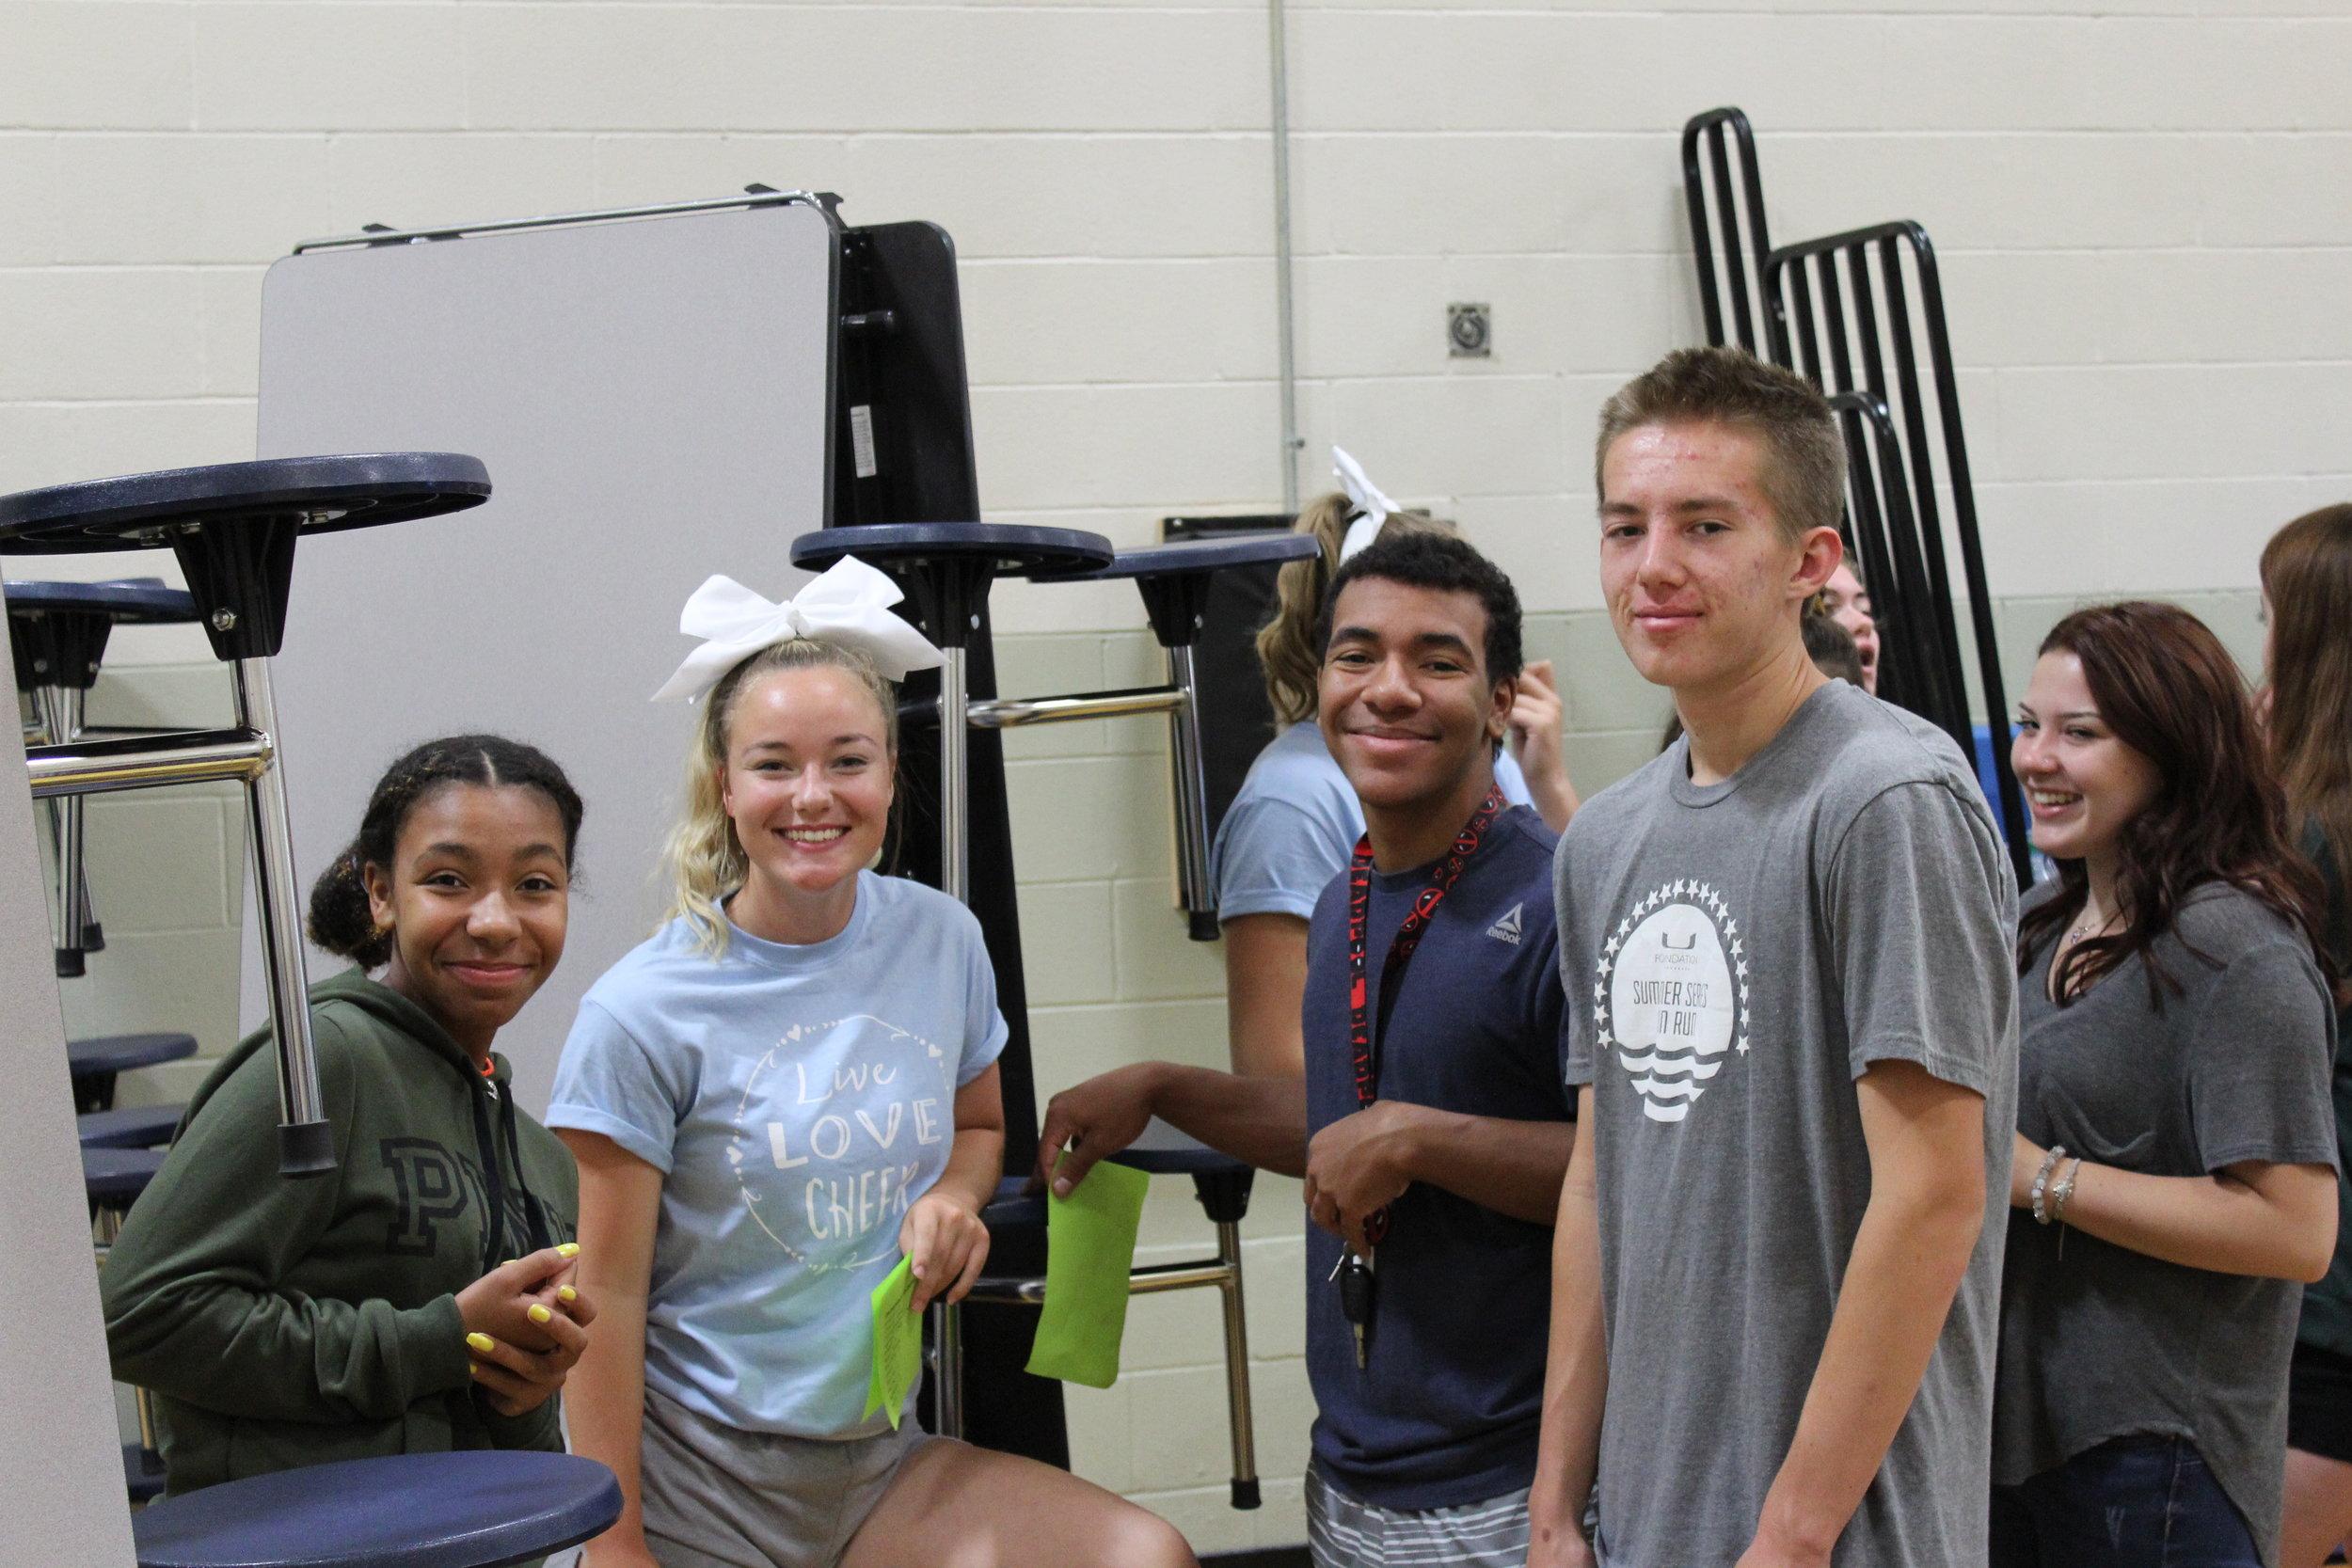 FBLA members_ Jasmine McGee, Dani Hillyard, RJ McGee, and Carter Hosking help with Back to School Fair.JPG